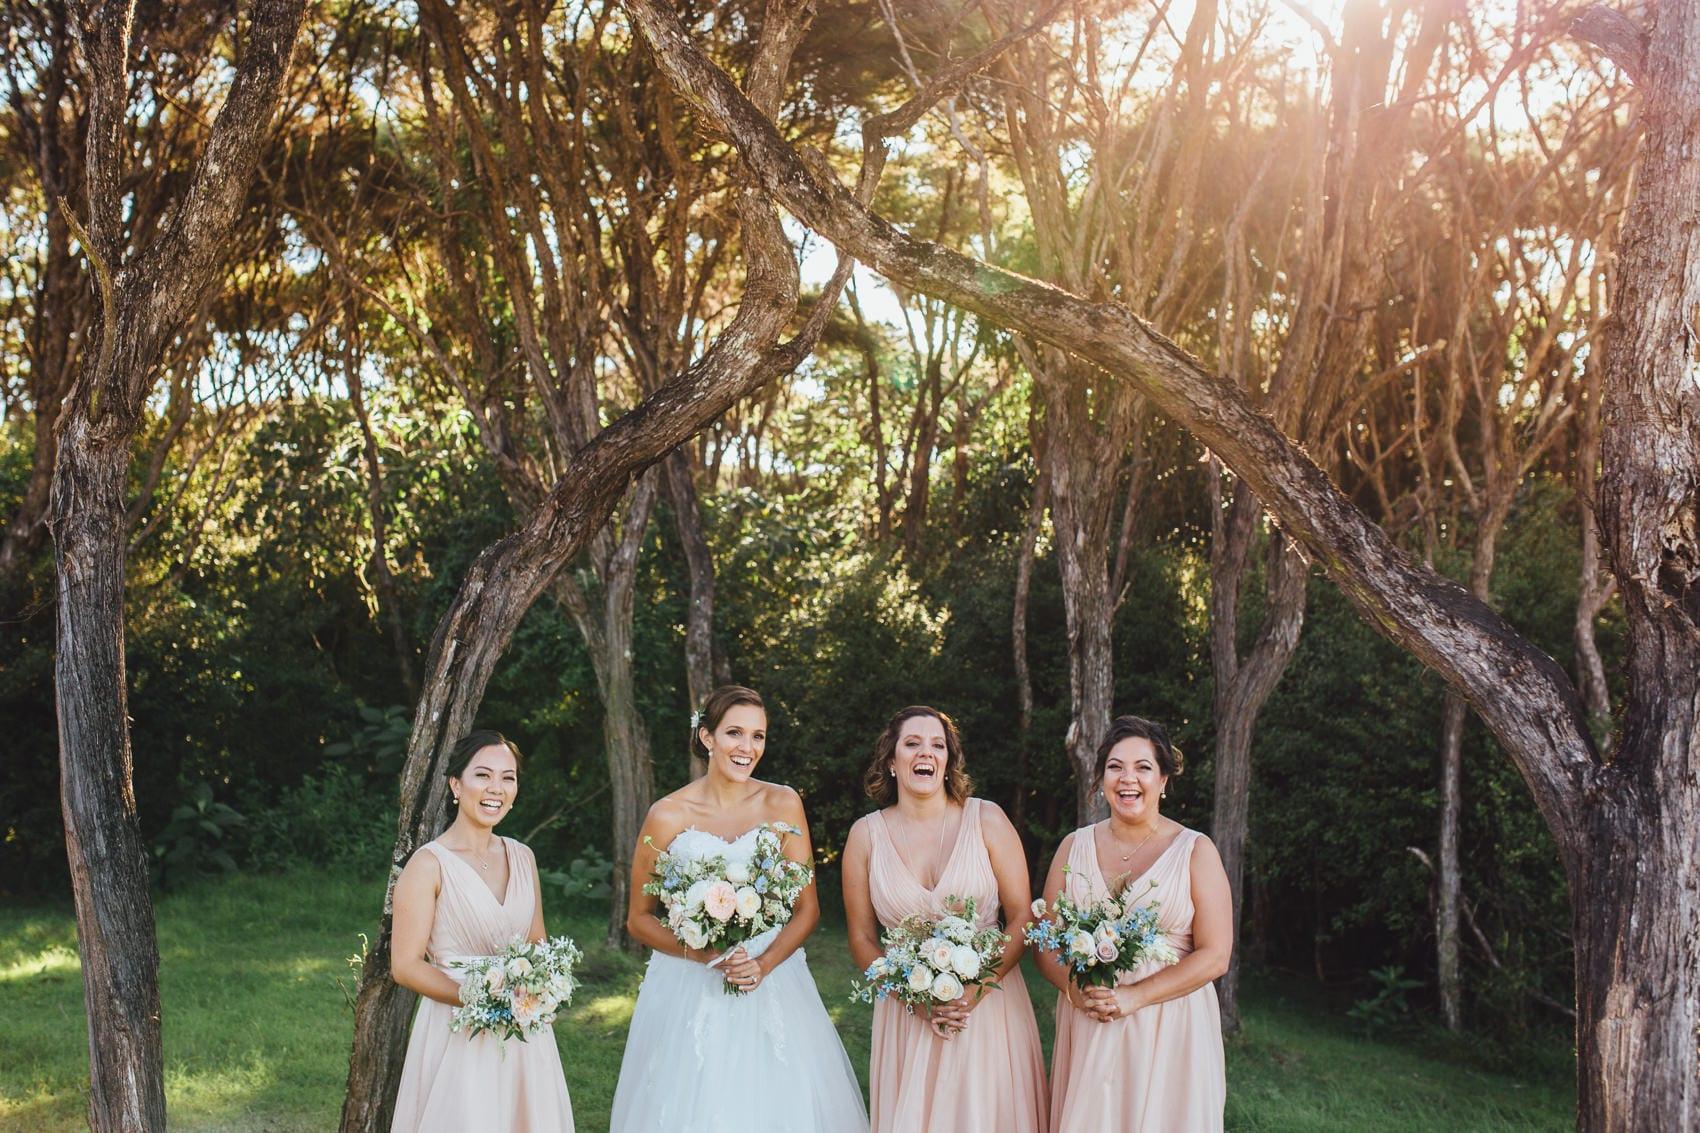 wedding_waiheke_elin_bandmann_photography-16